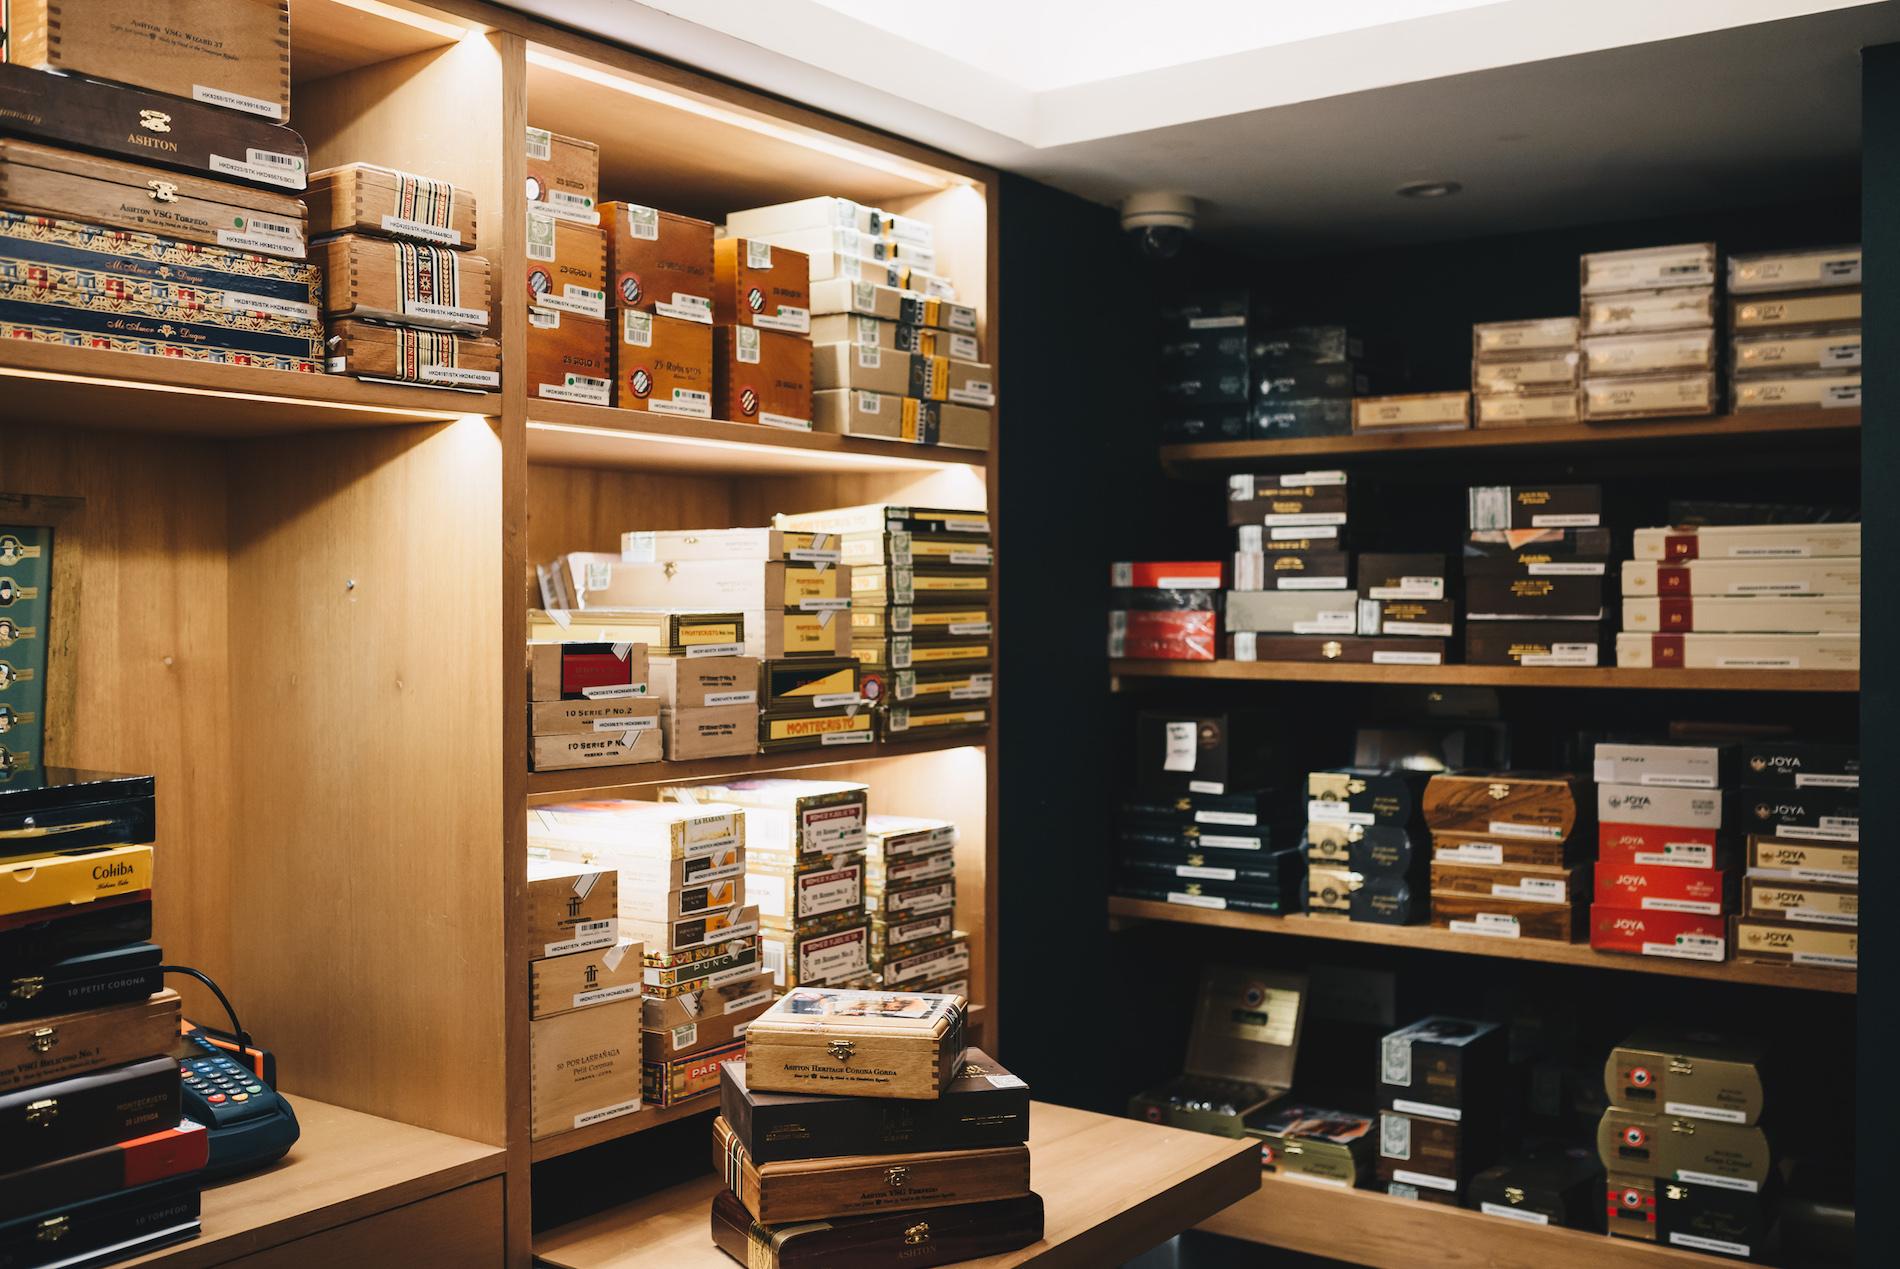 Bertie Cigars photos